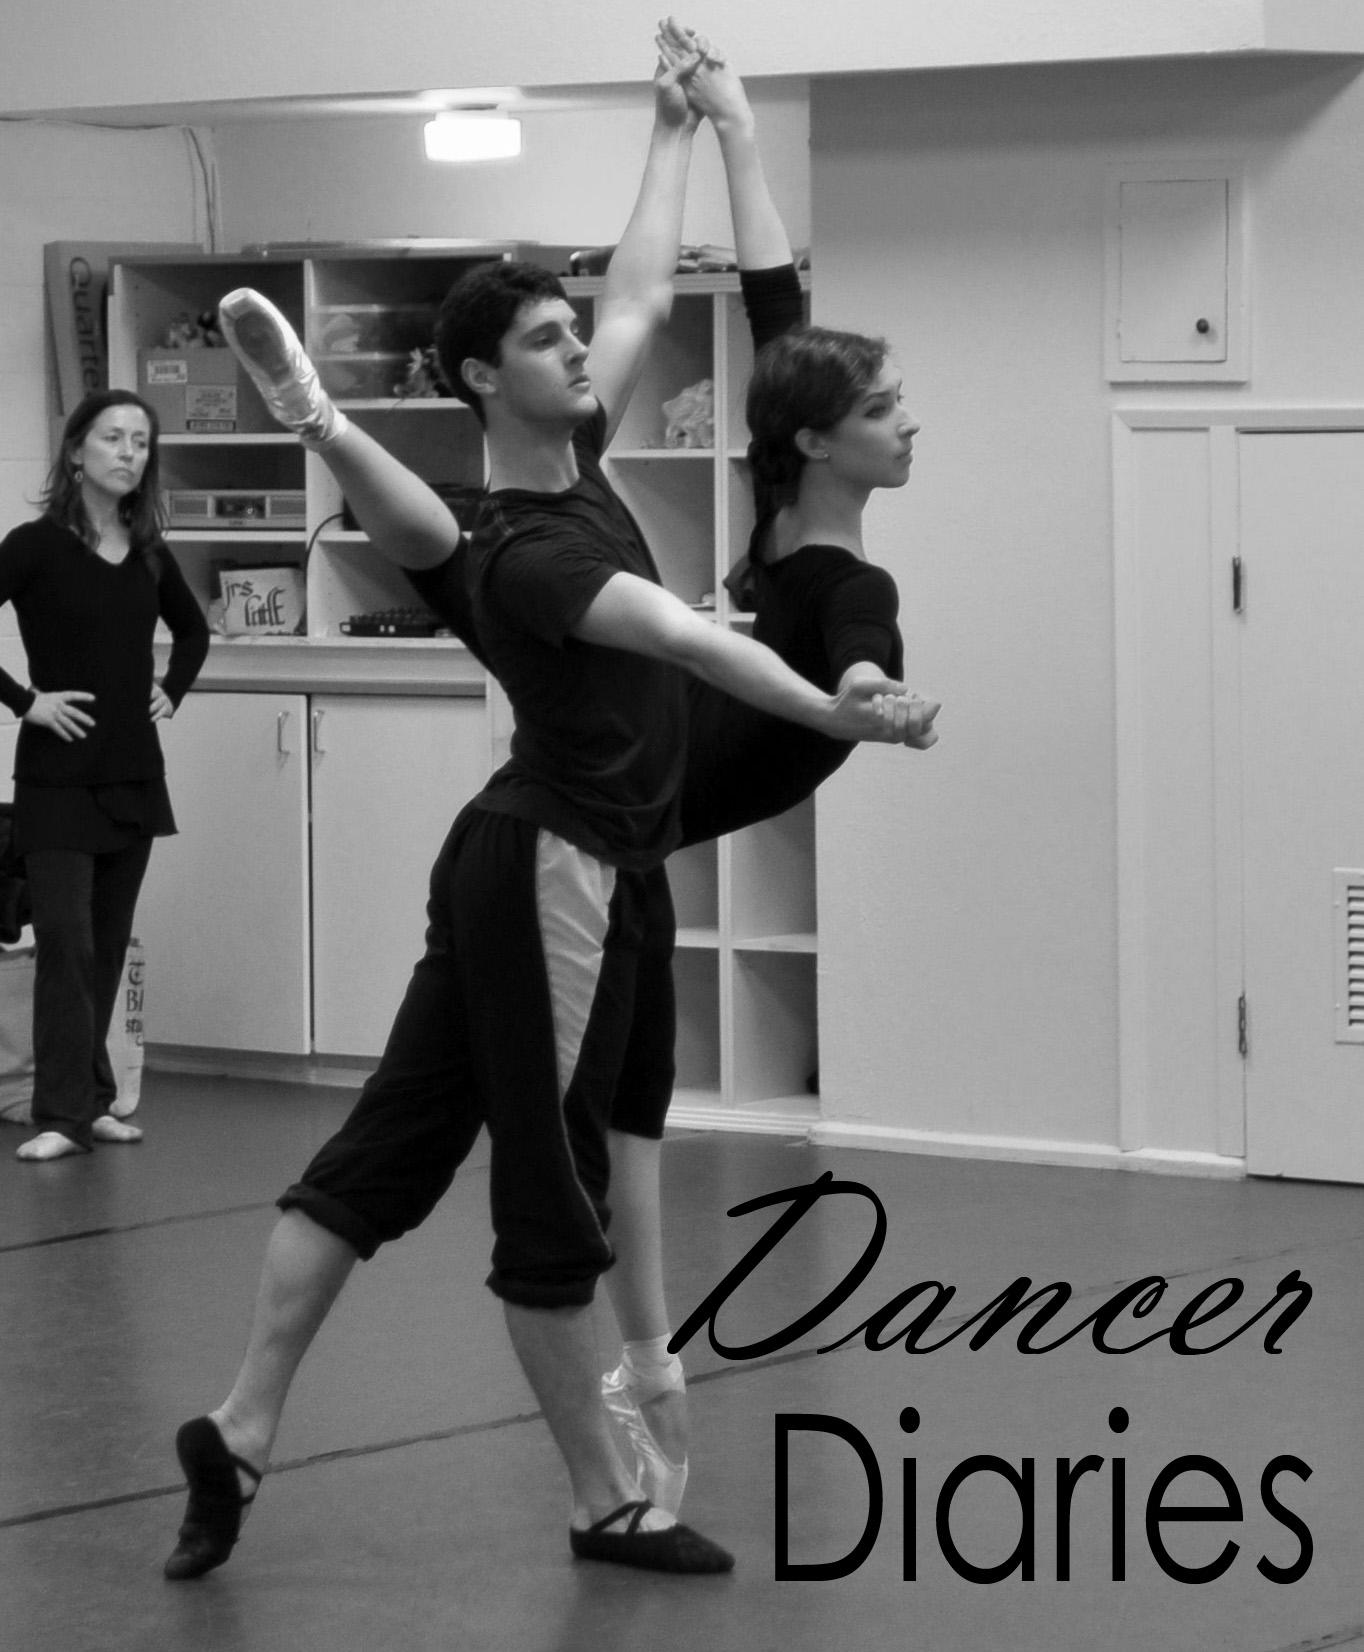 dancer-diaries-image-via-terry-slobodnik